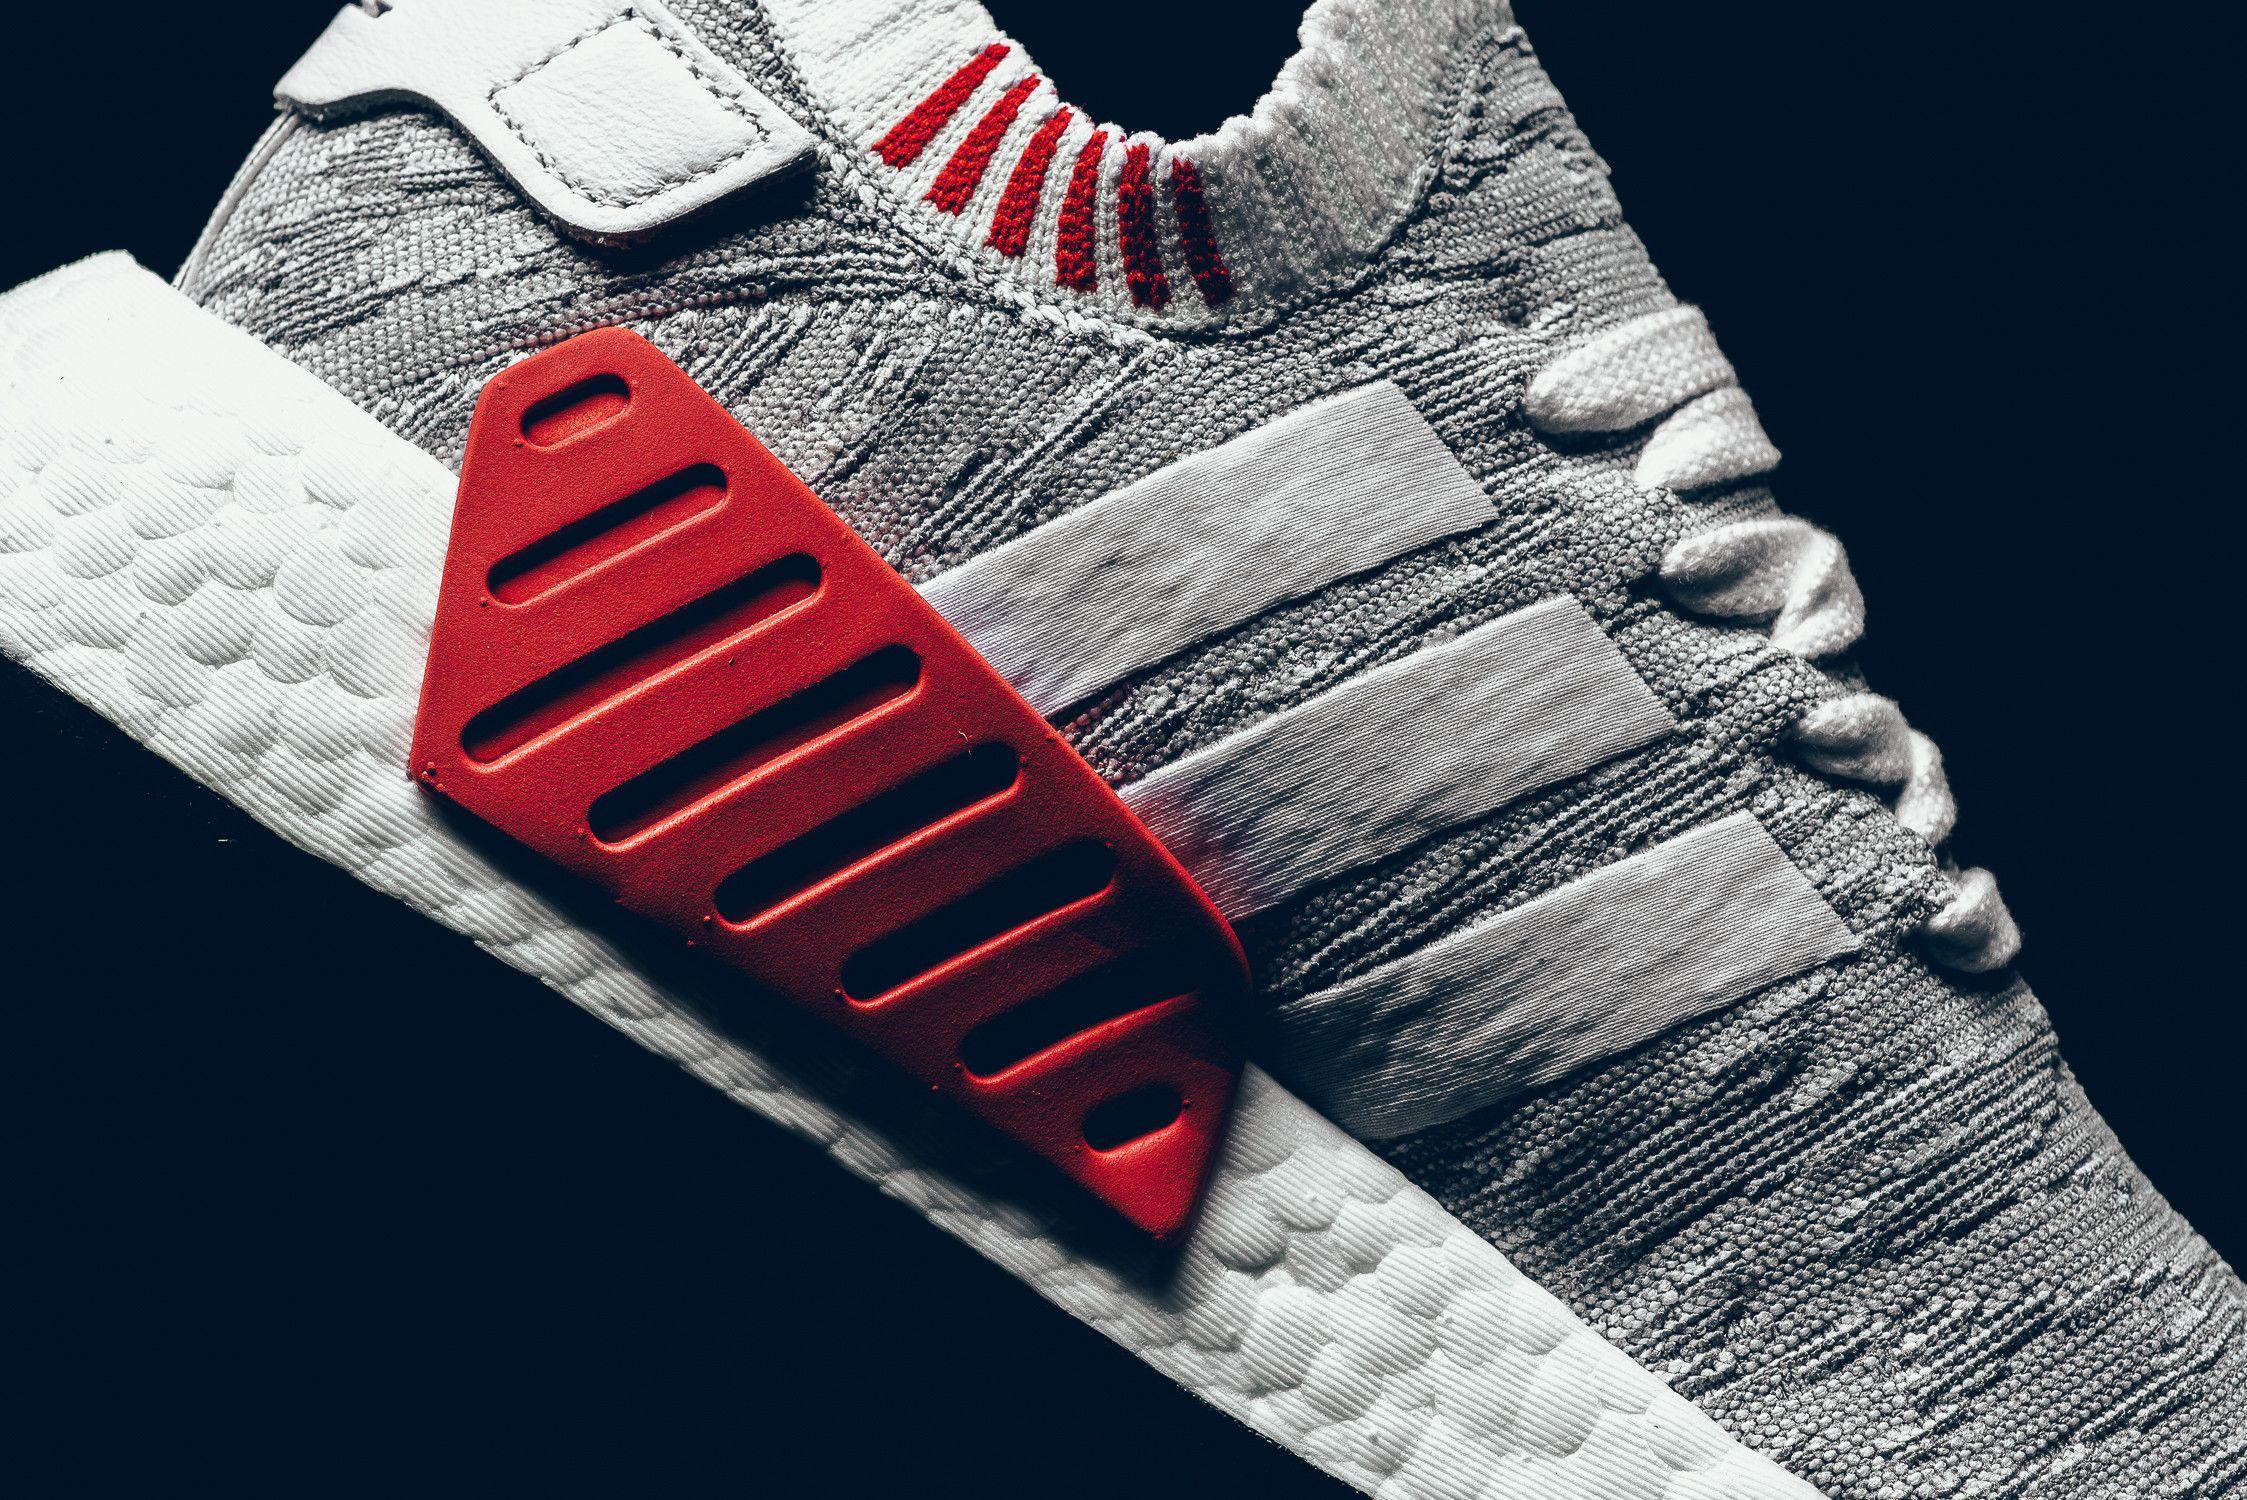 adidas-NMD-R2-Primeknit-White-Grey-Red-6